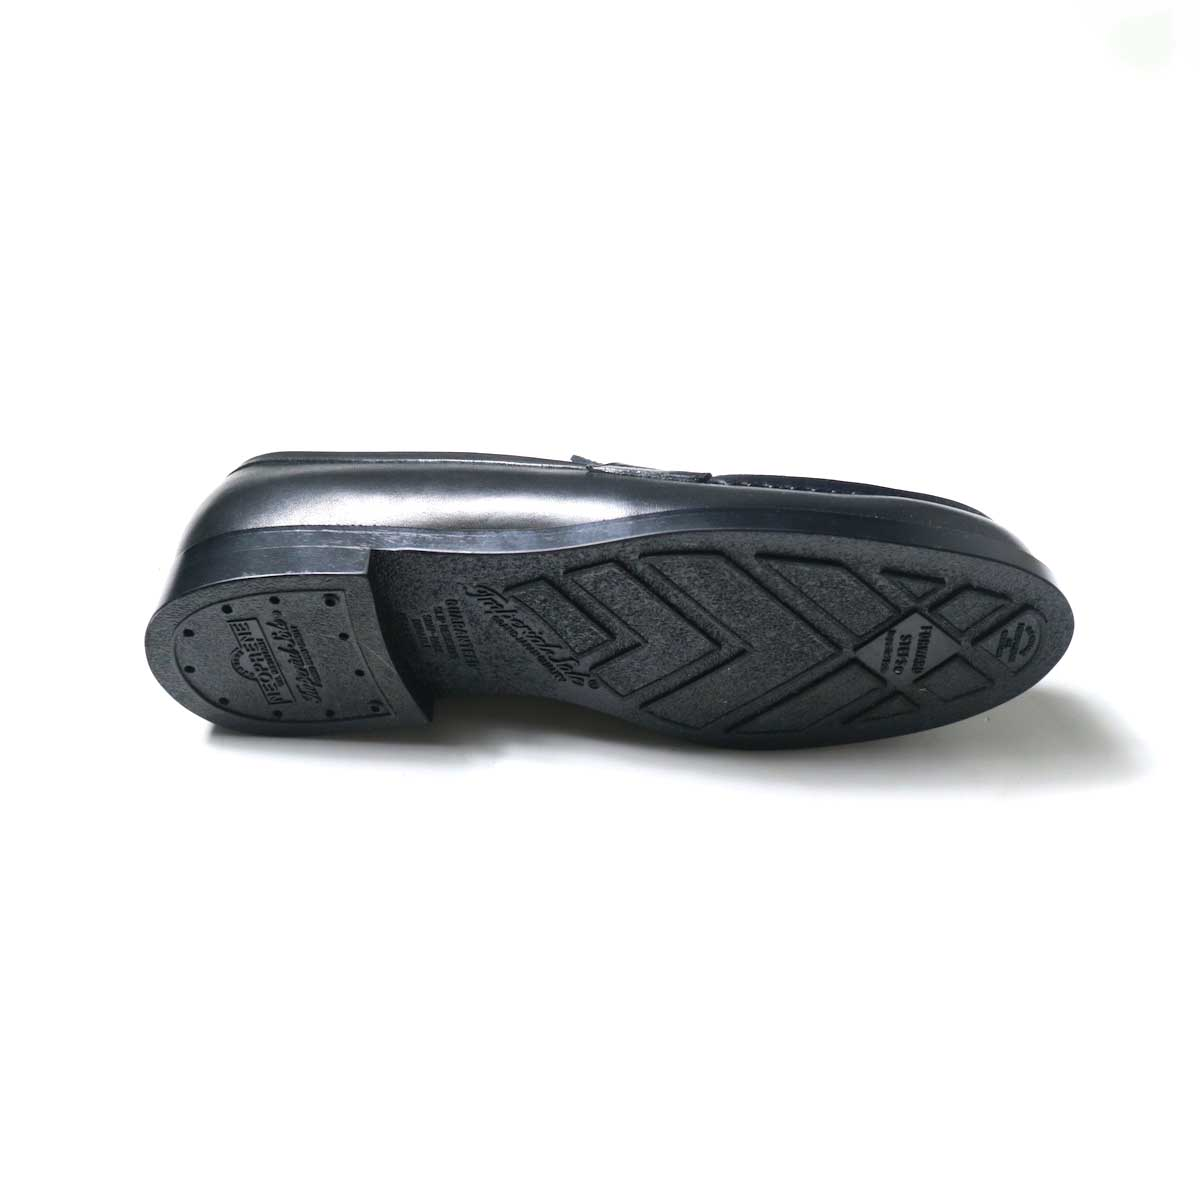 FOOTSTOCK ORIGINALS / LOAFER (Black)アウトソール